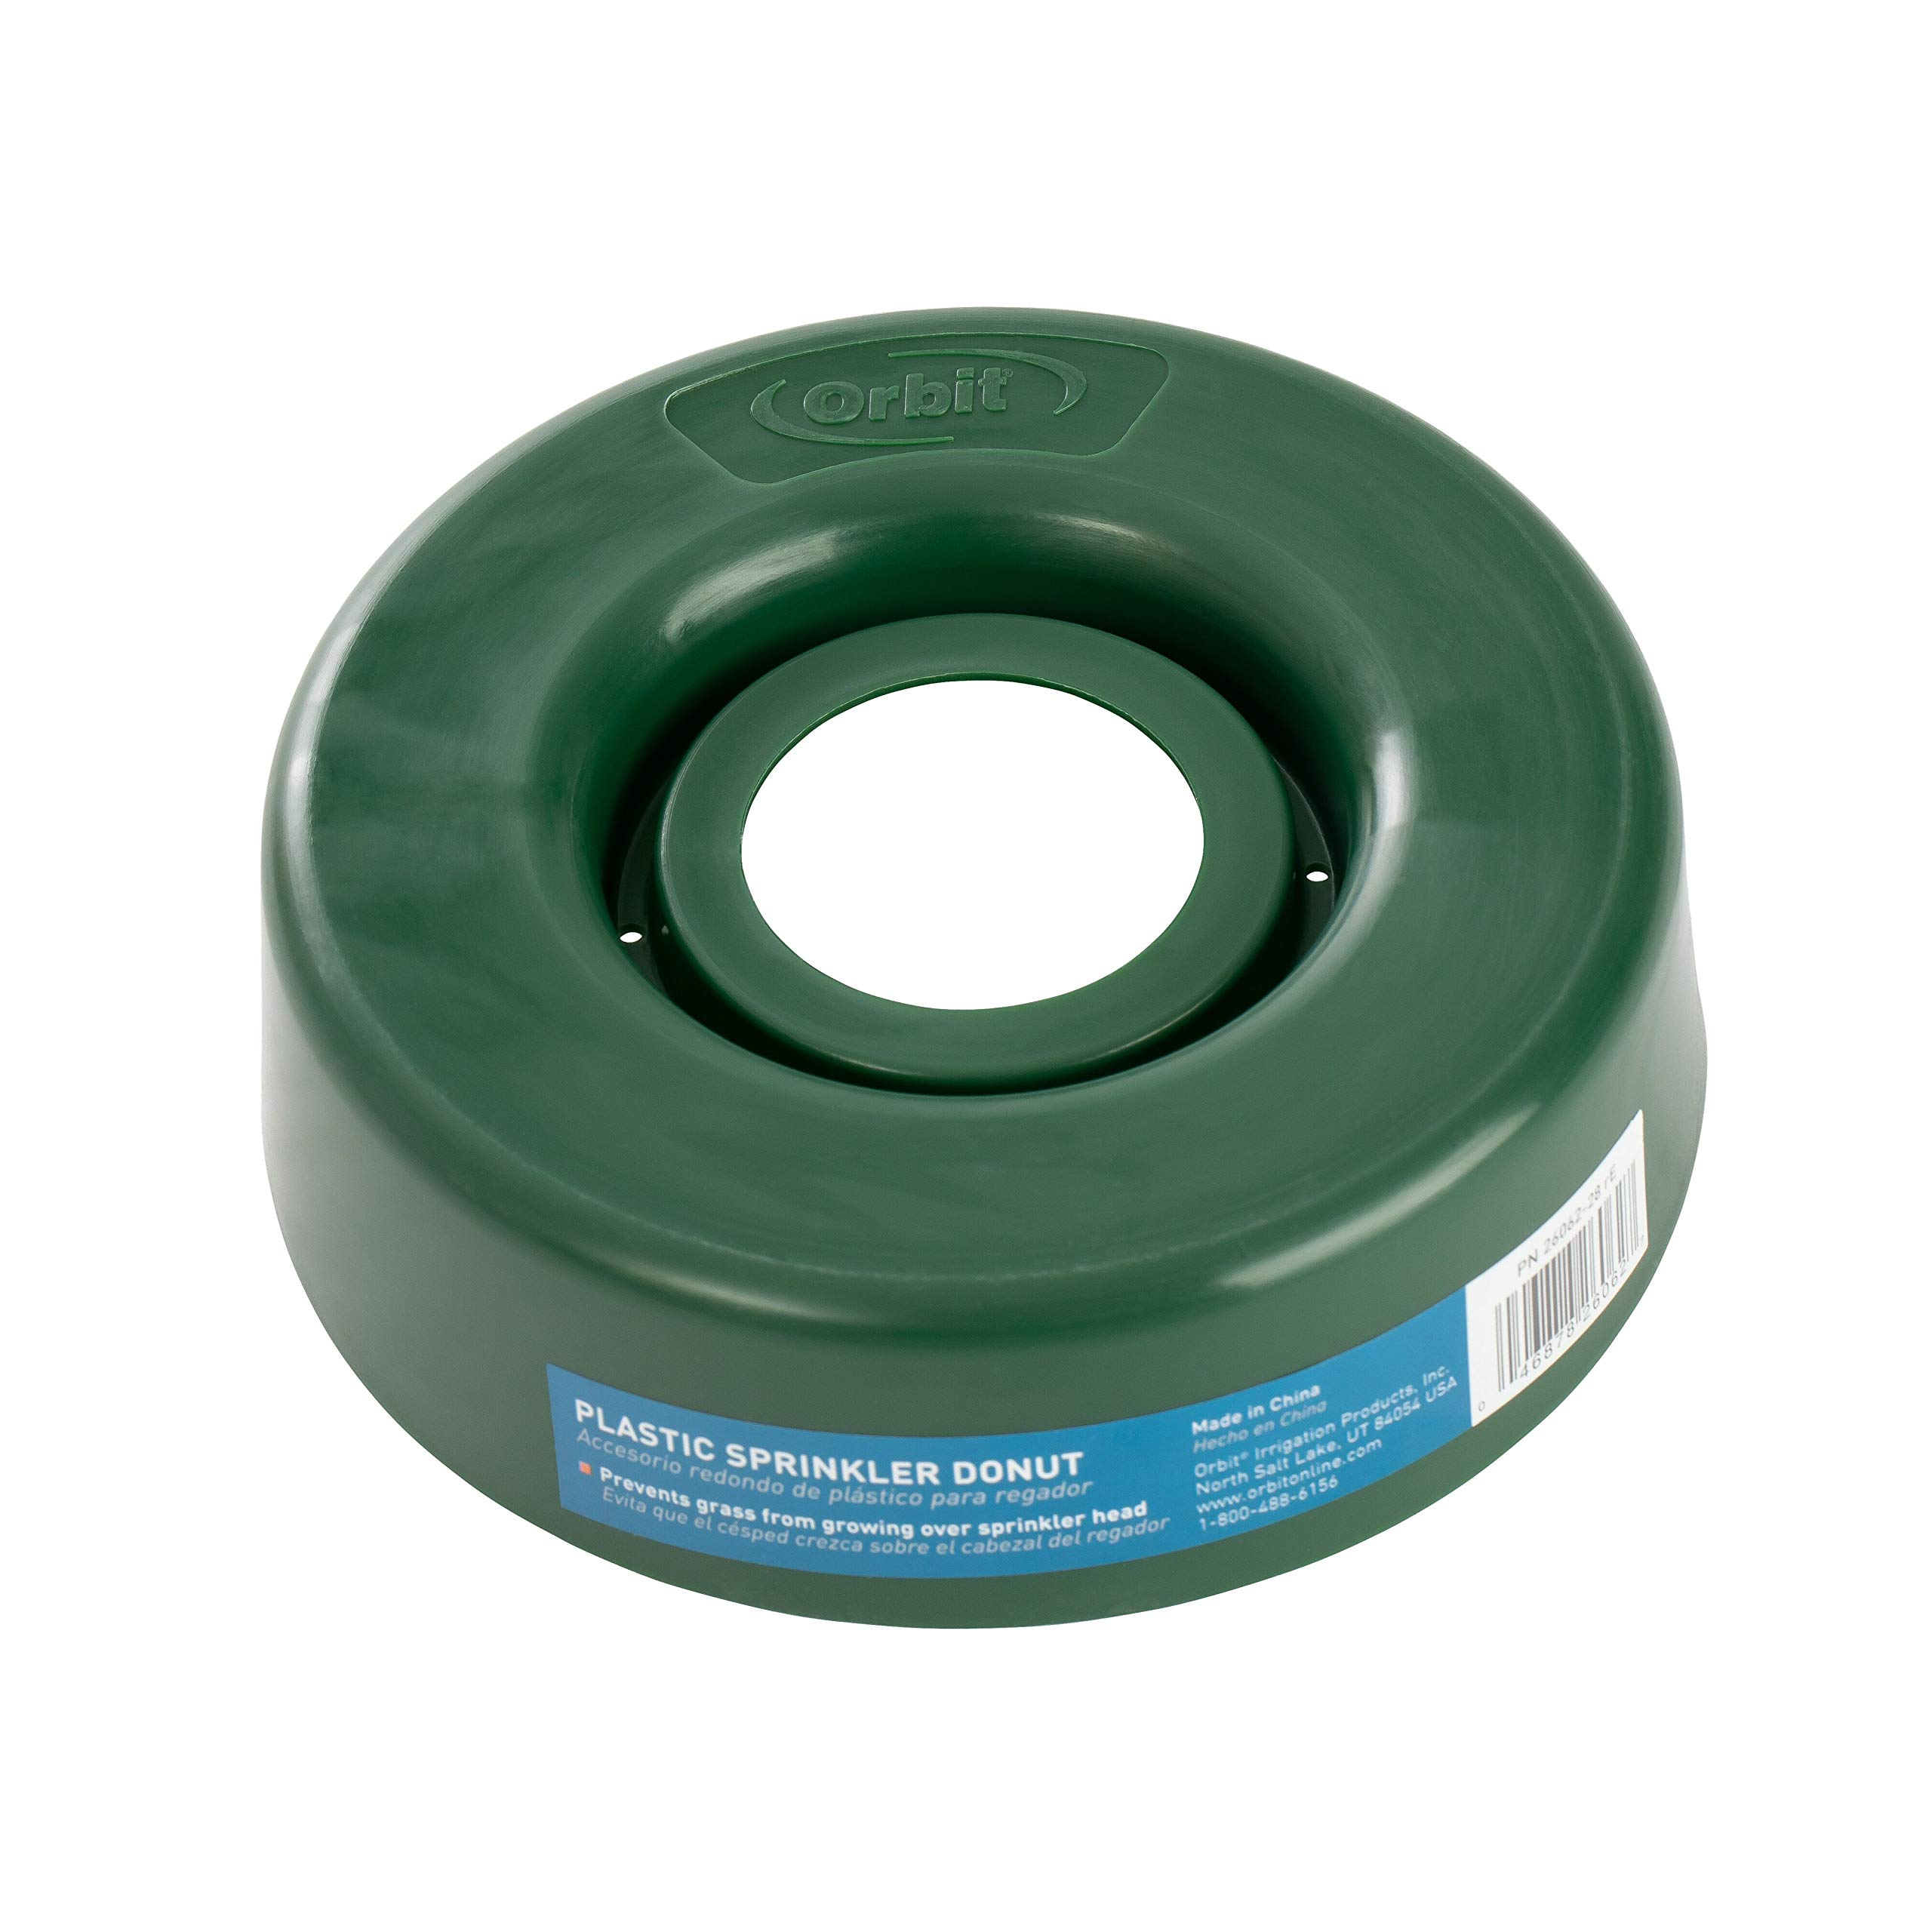 10 Pack - Orbit Plastic Grass Over Growth Sprinkler Guard Donut by Orbit